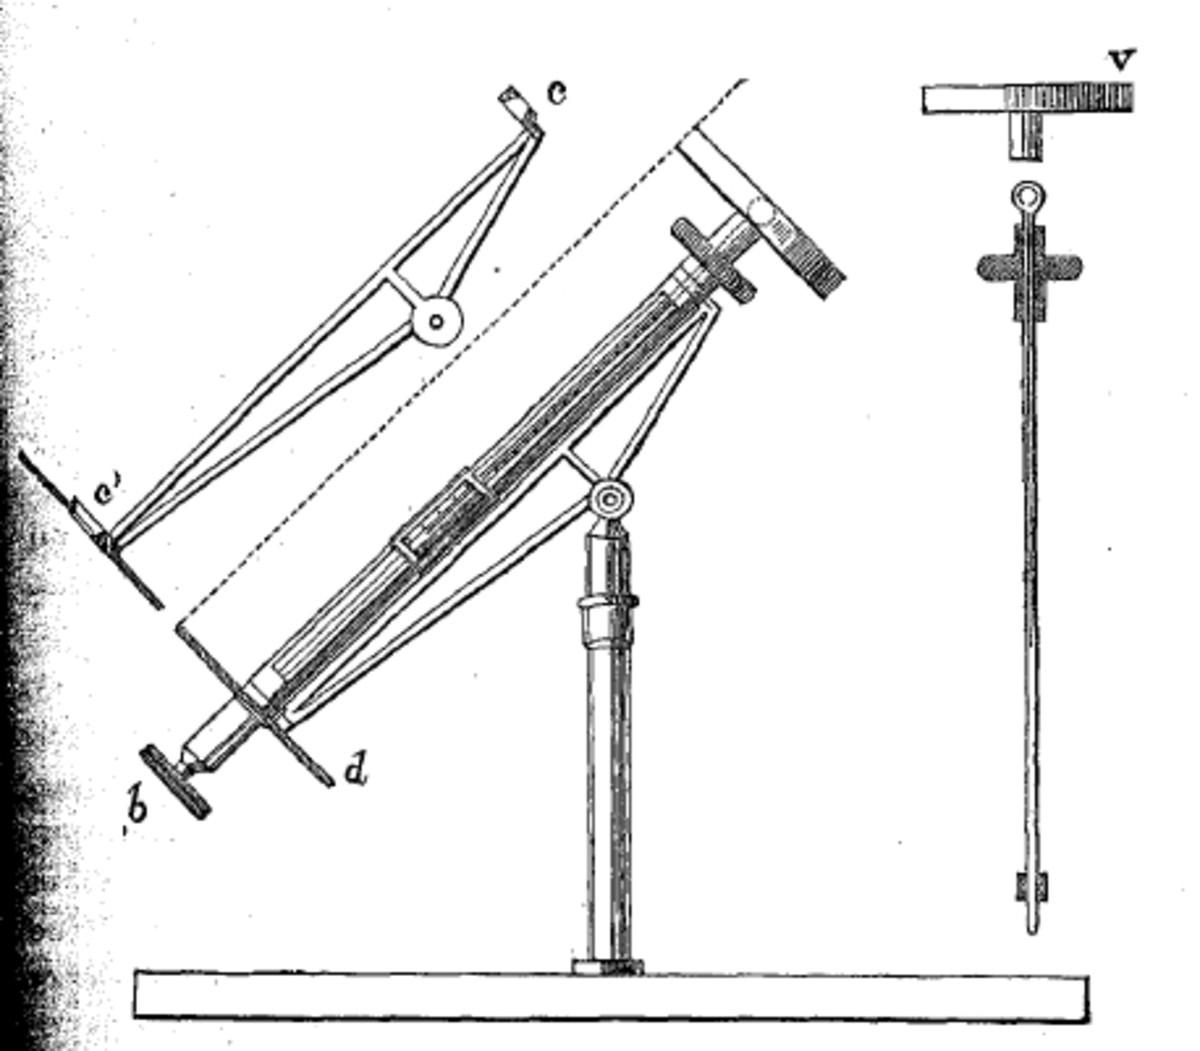 Pouillet's pyrheliometer.